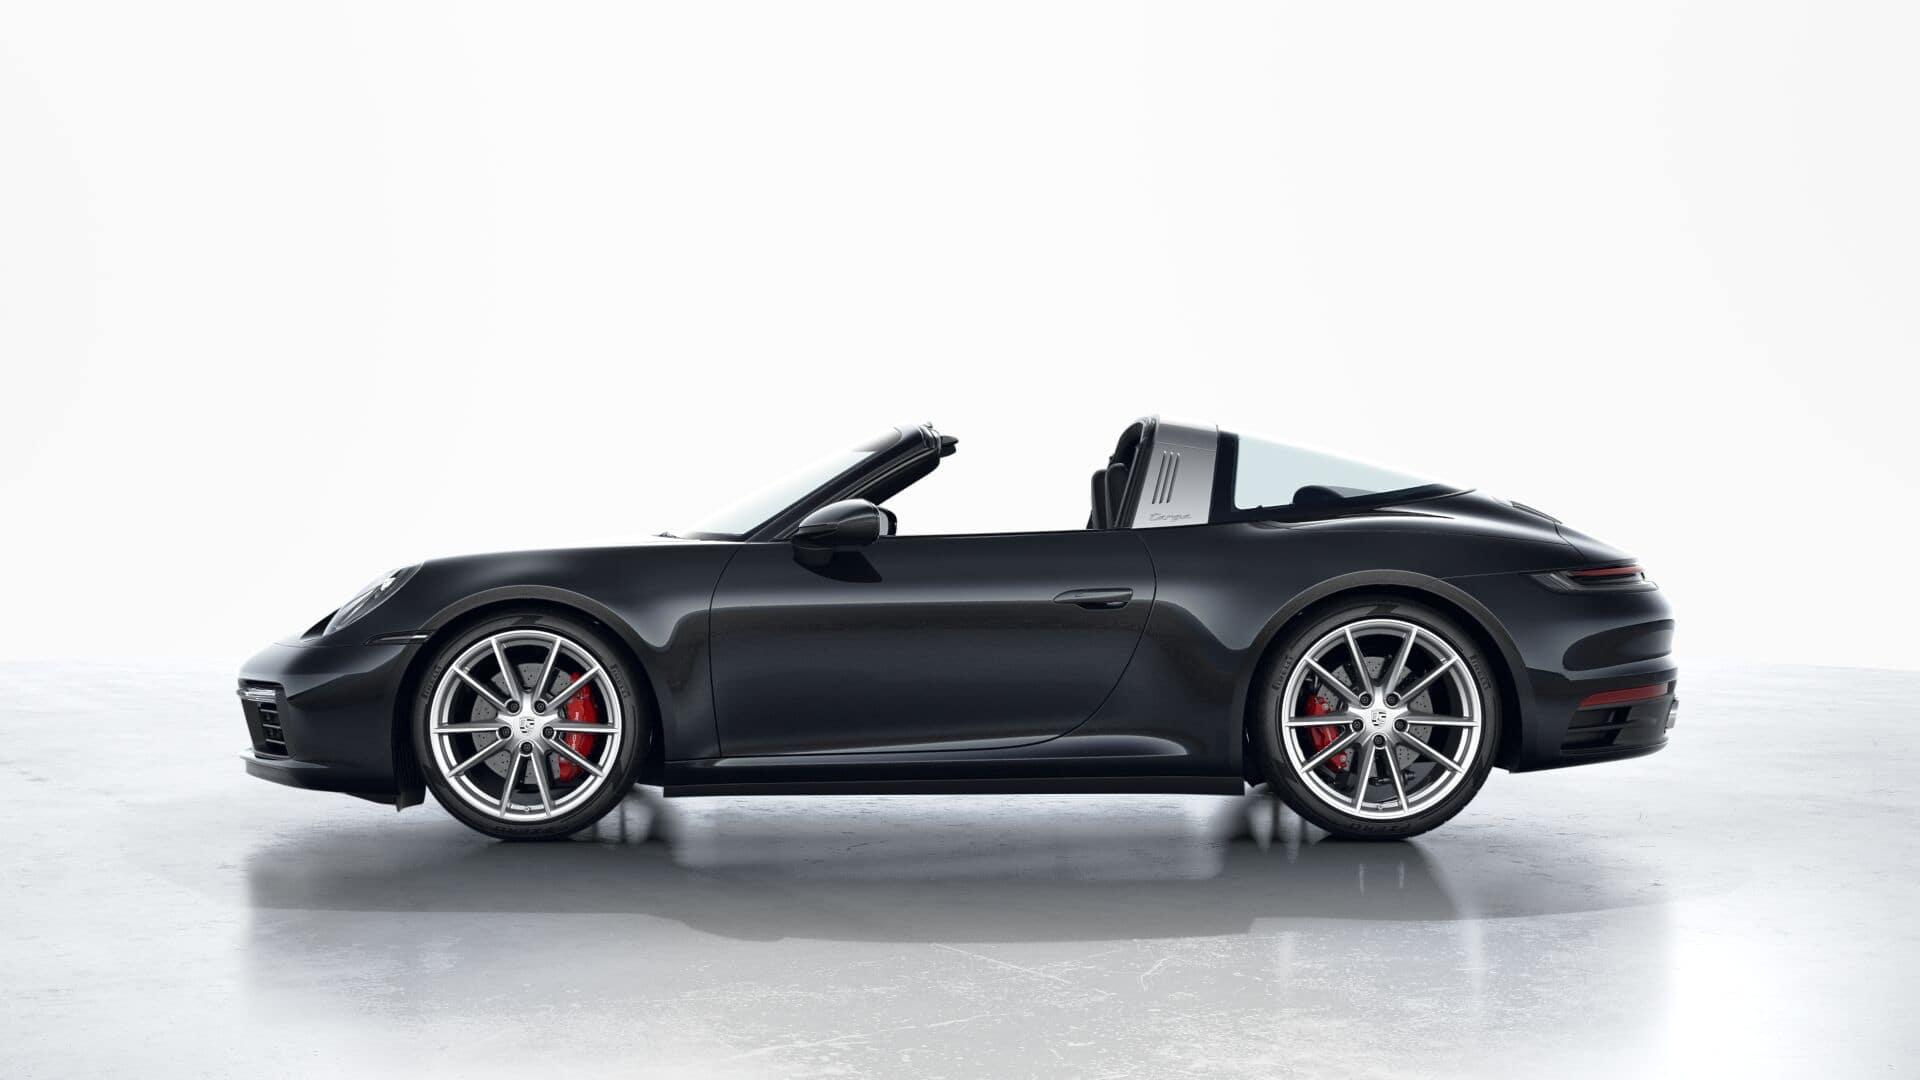 2021 Porsche 911 Targa 4S Trim Model Information | Porsche Minneapolis